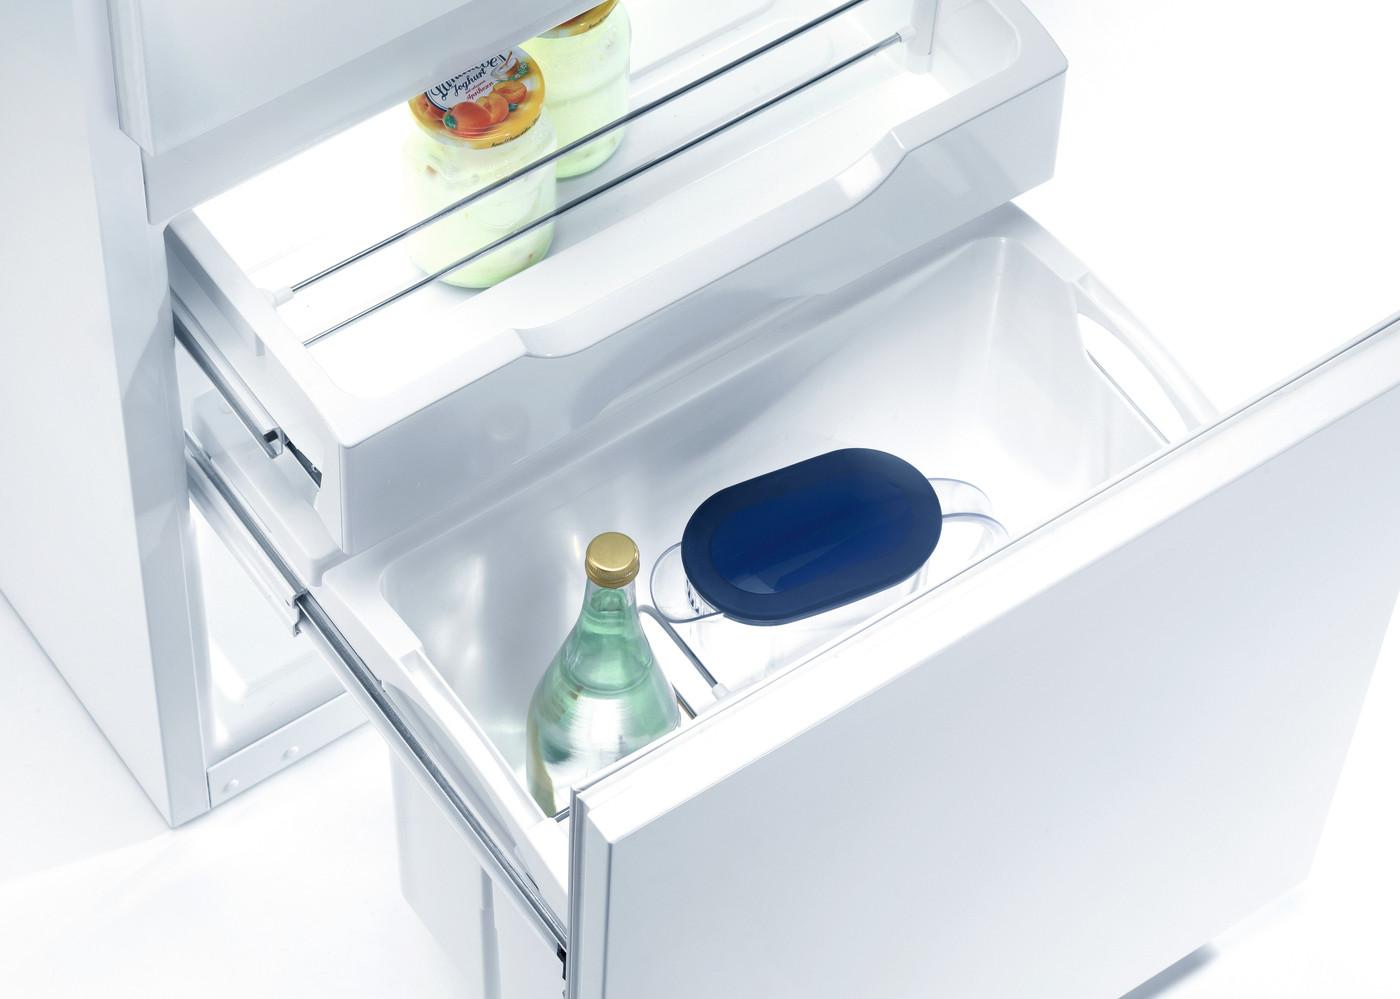 Kellerfach des Kühlschranks Miele K 9726 iF-1